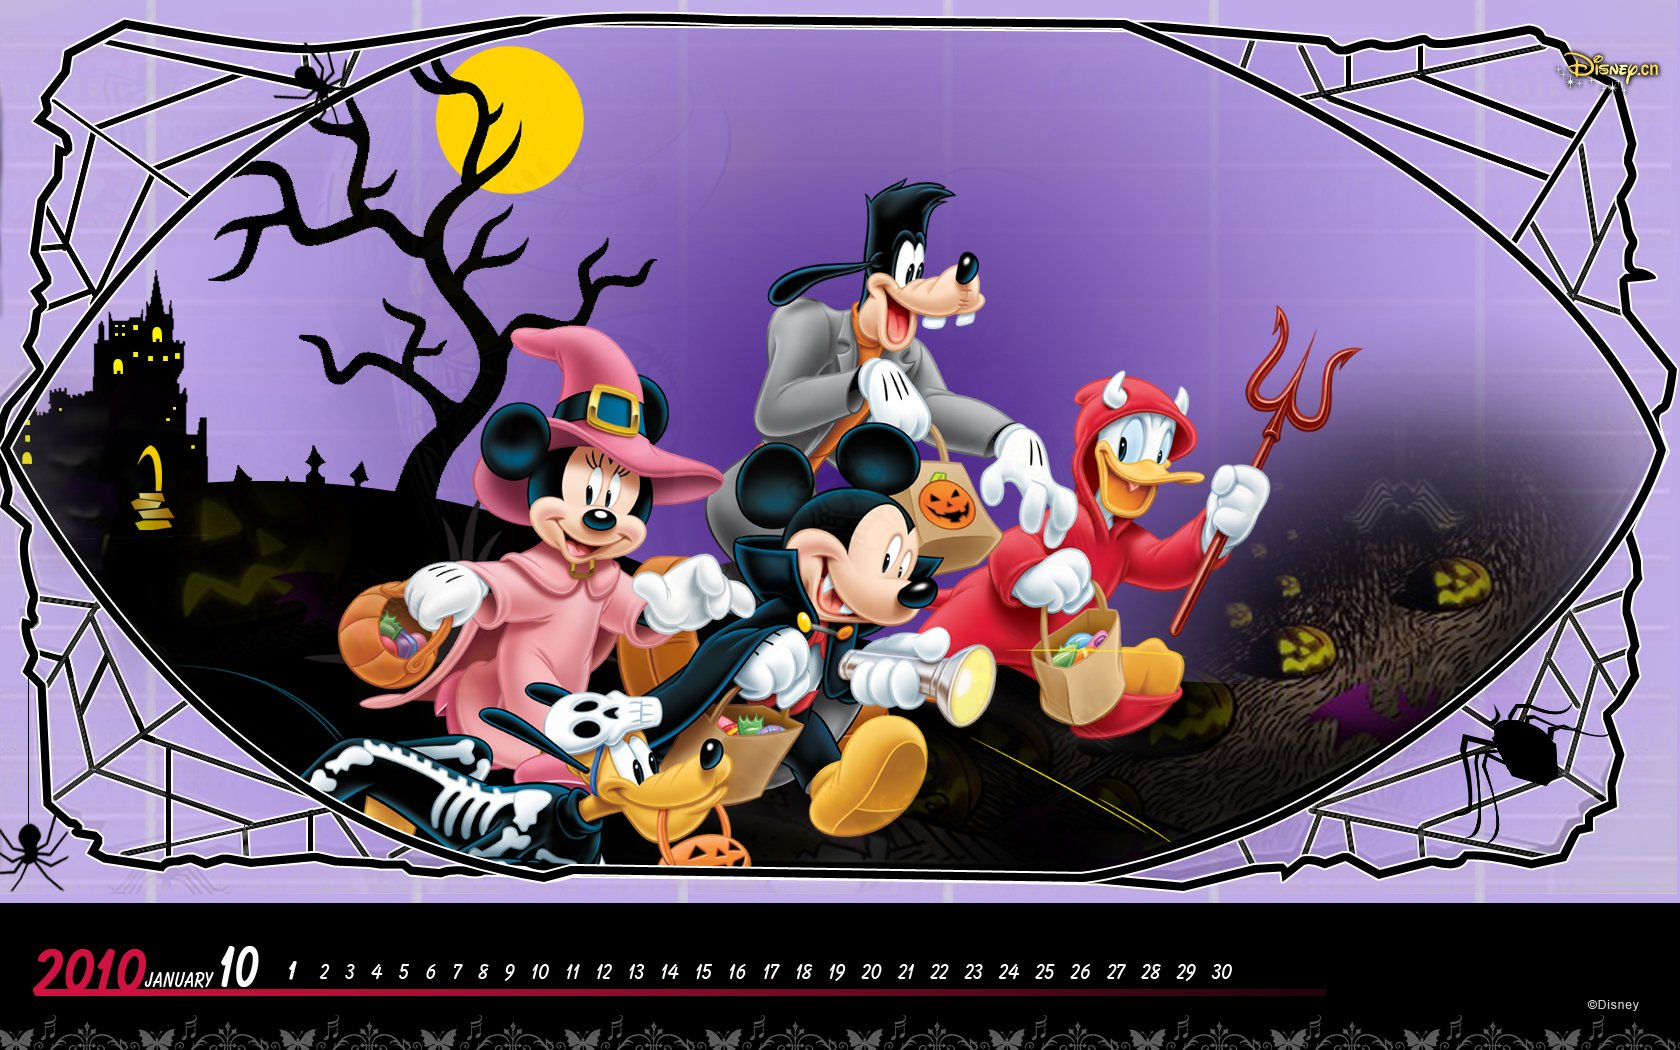 Mickey Mouse Wallpaper Iphone 4 Mickey Mouse And Friends Fondo De Pantalla And Fondo De